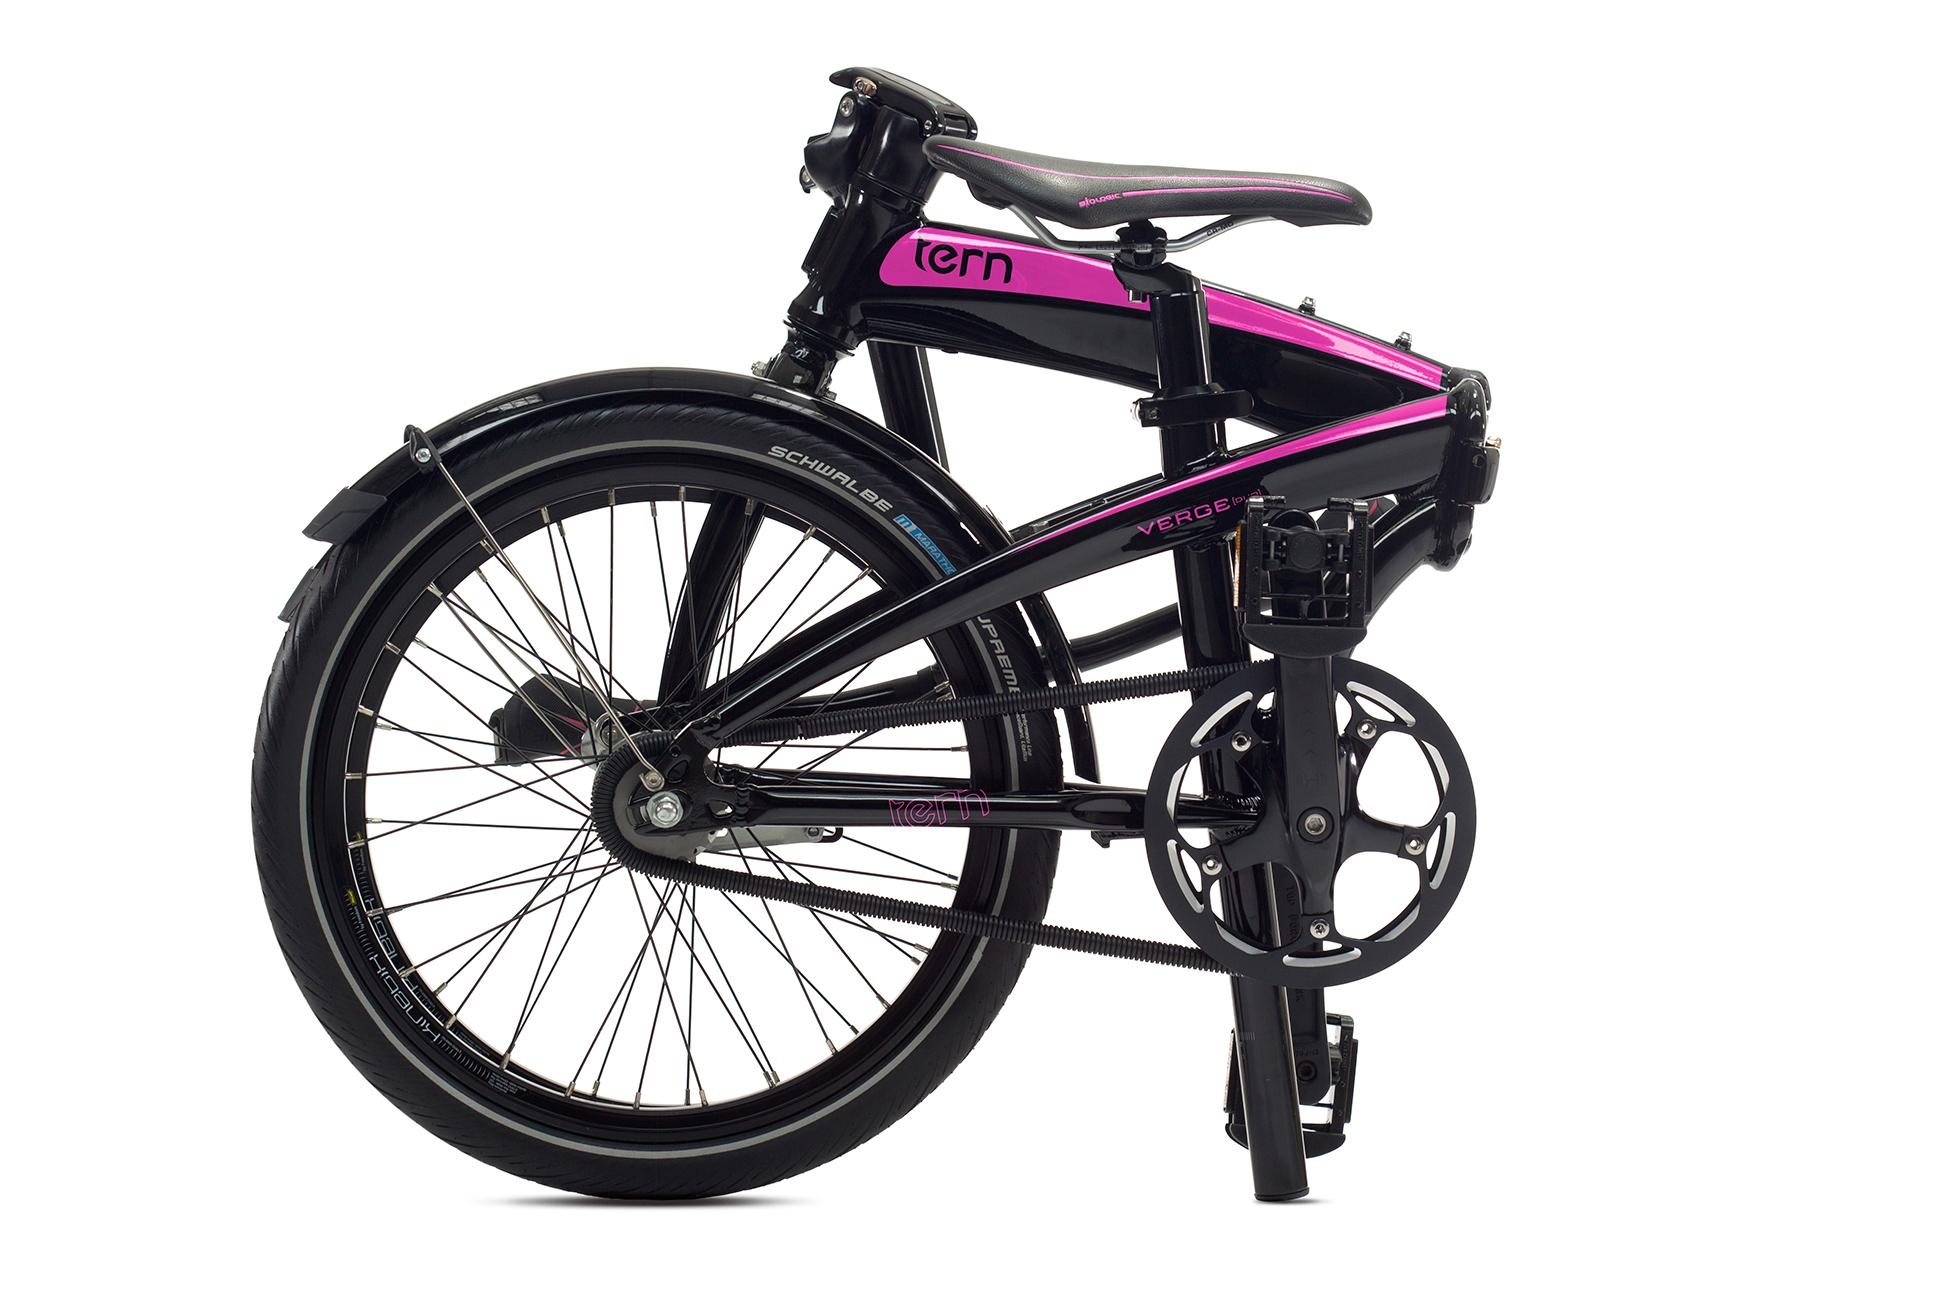 Verge Duo Tern Folding Bikes Philippines